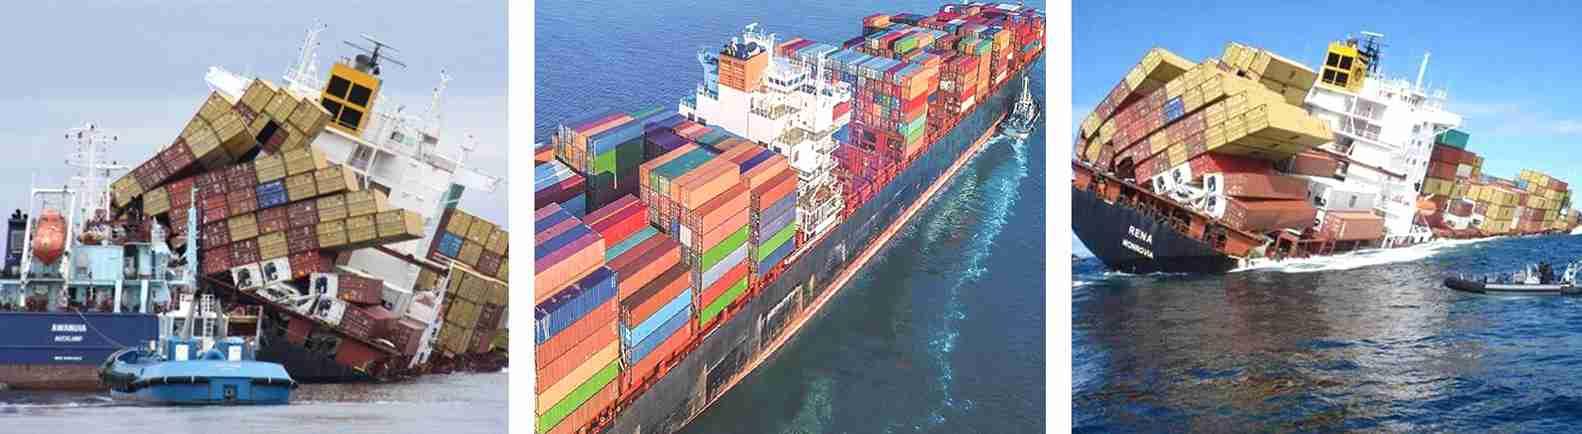 environmental chamber's damage during sea shipment